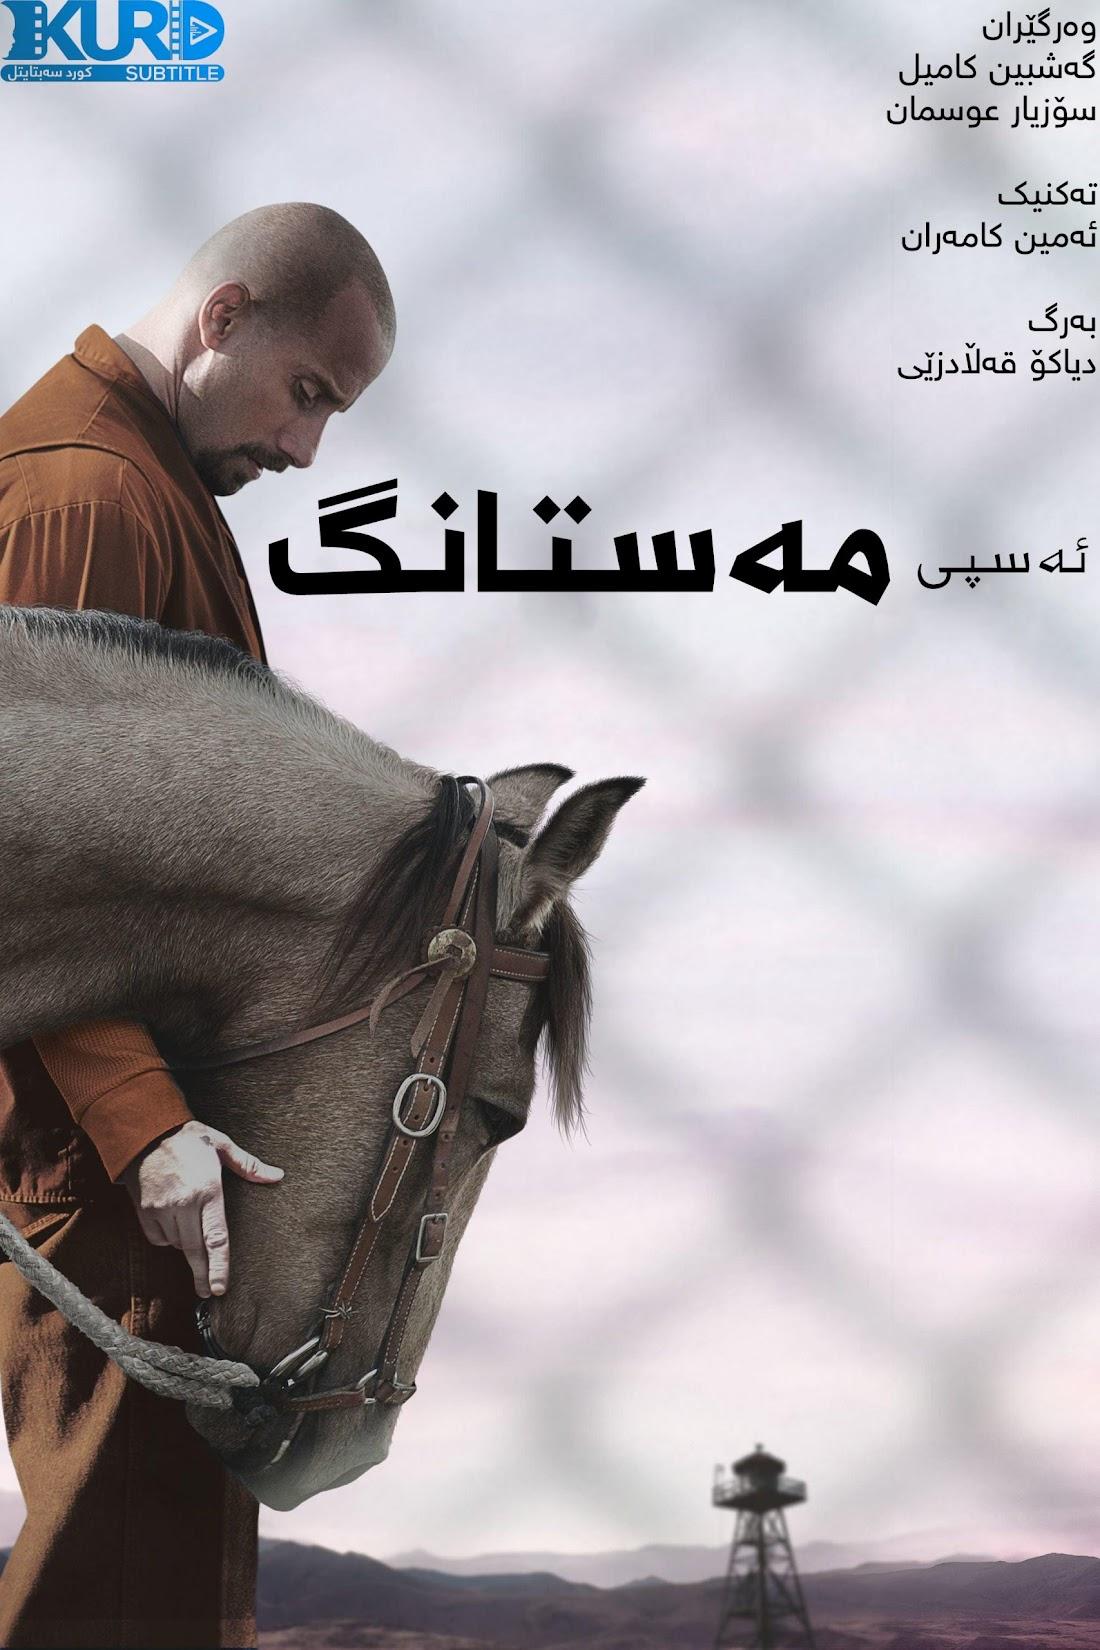 The Mustang kurdish poster